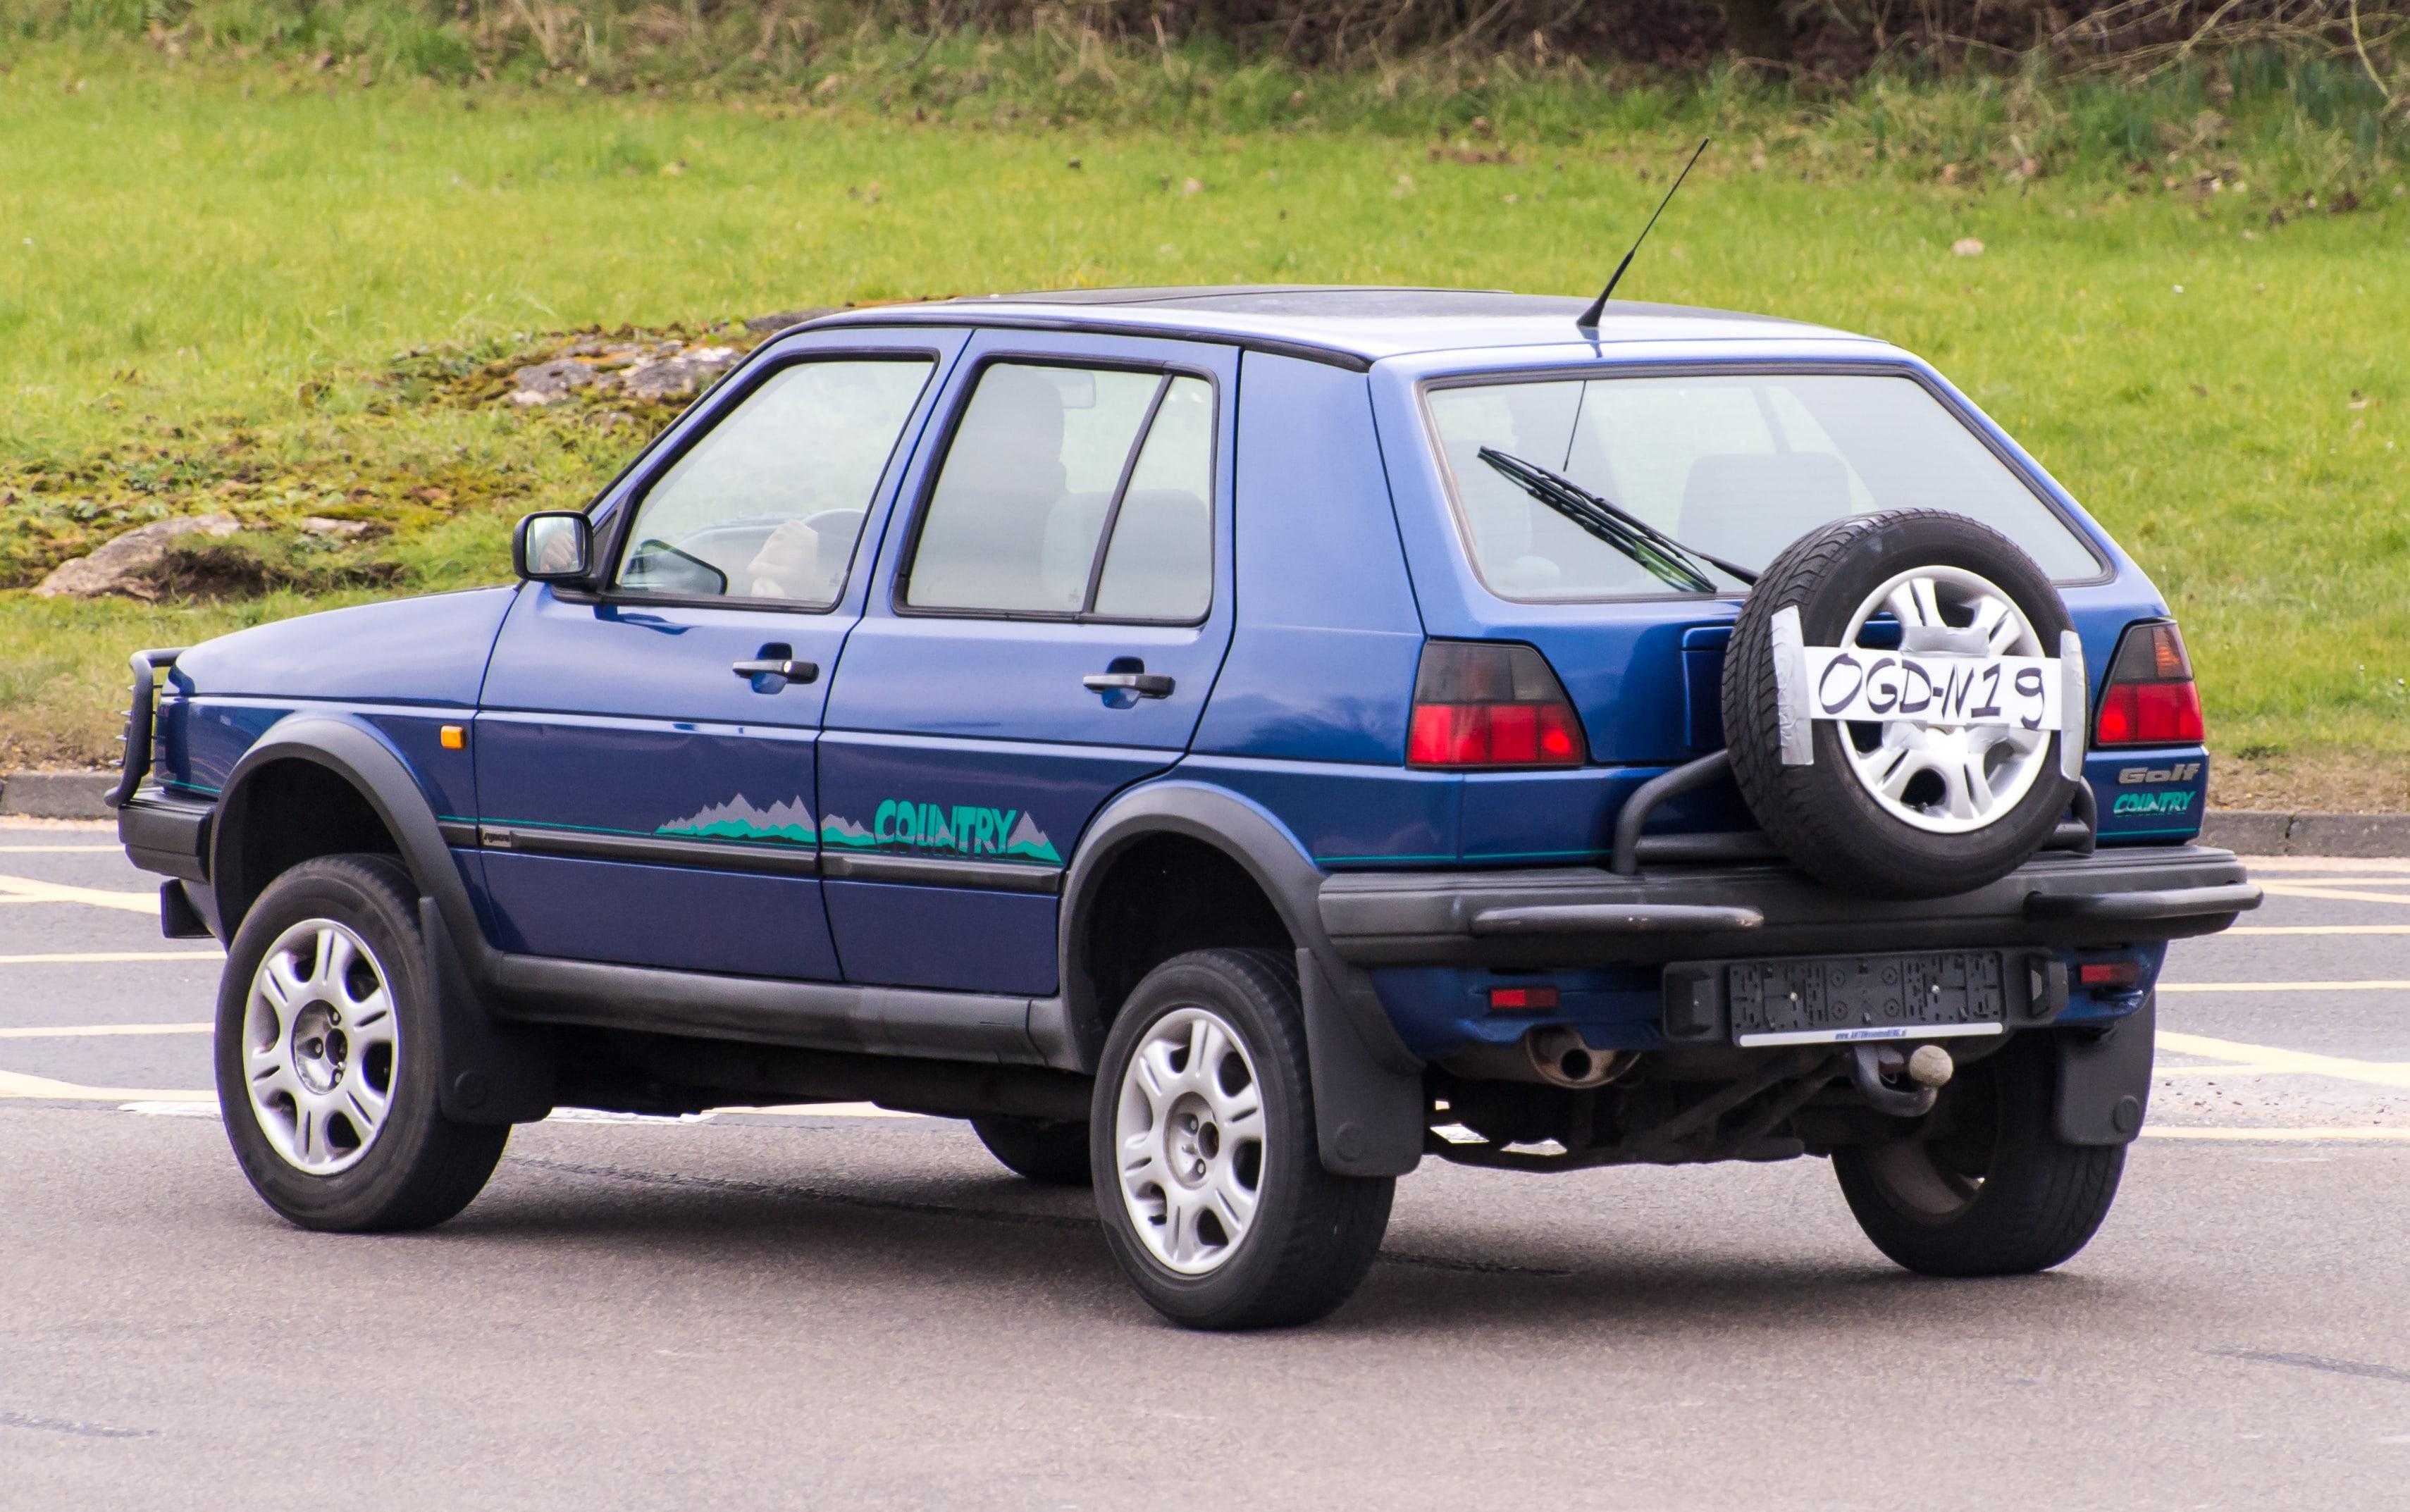 Volkswagen Golf Country Wallpapers hd